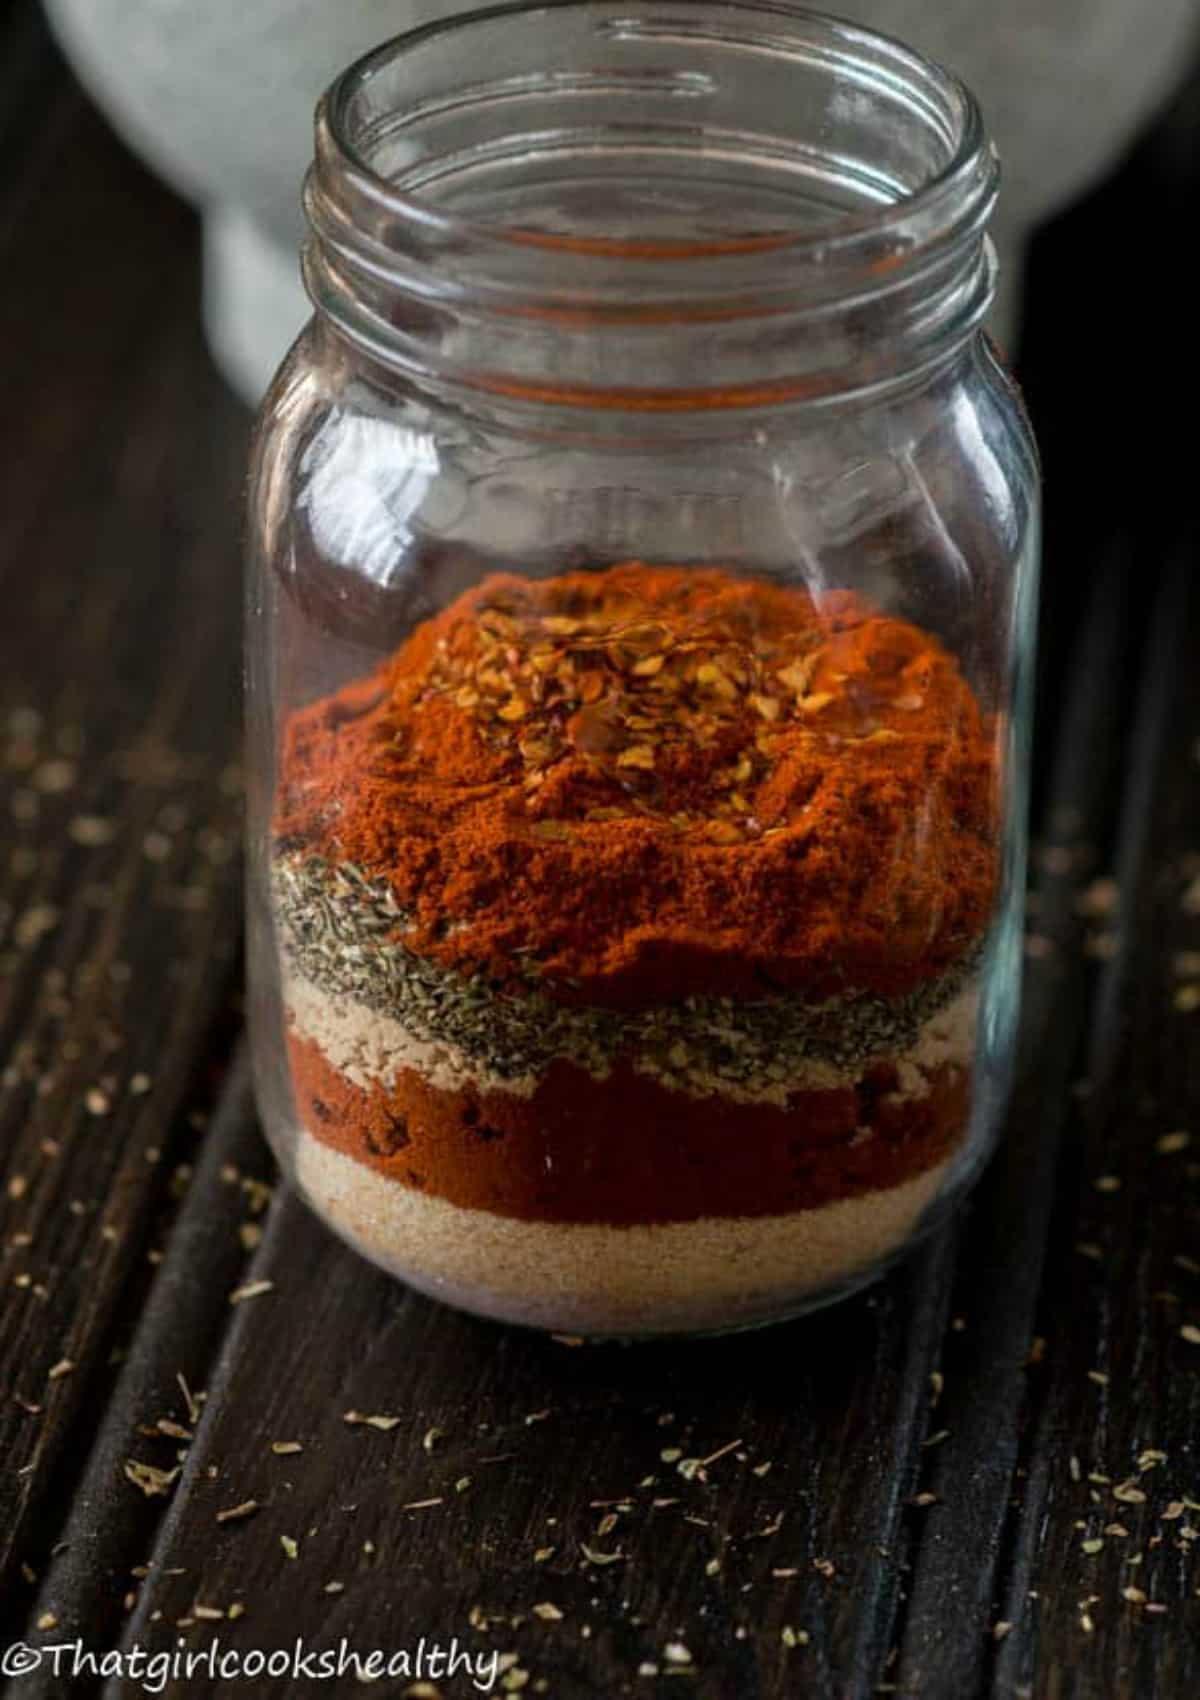 Half a spice blend in the jar